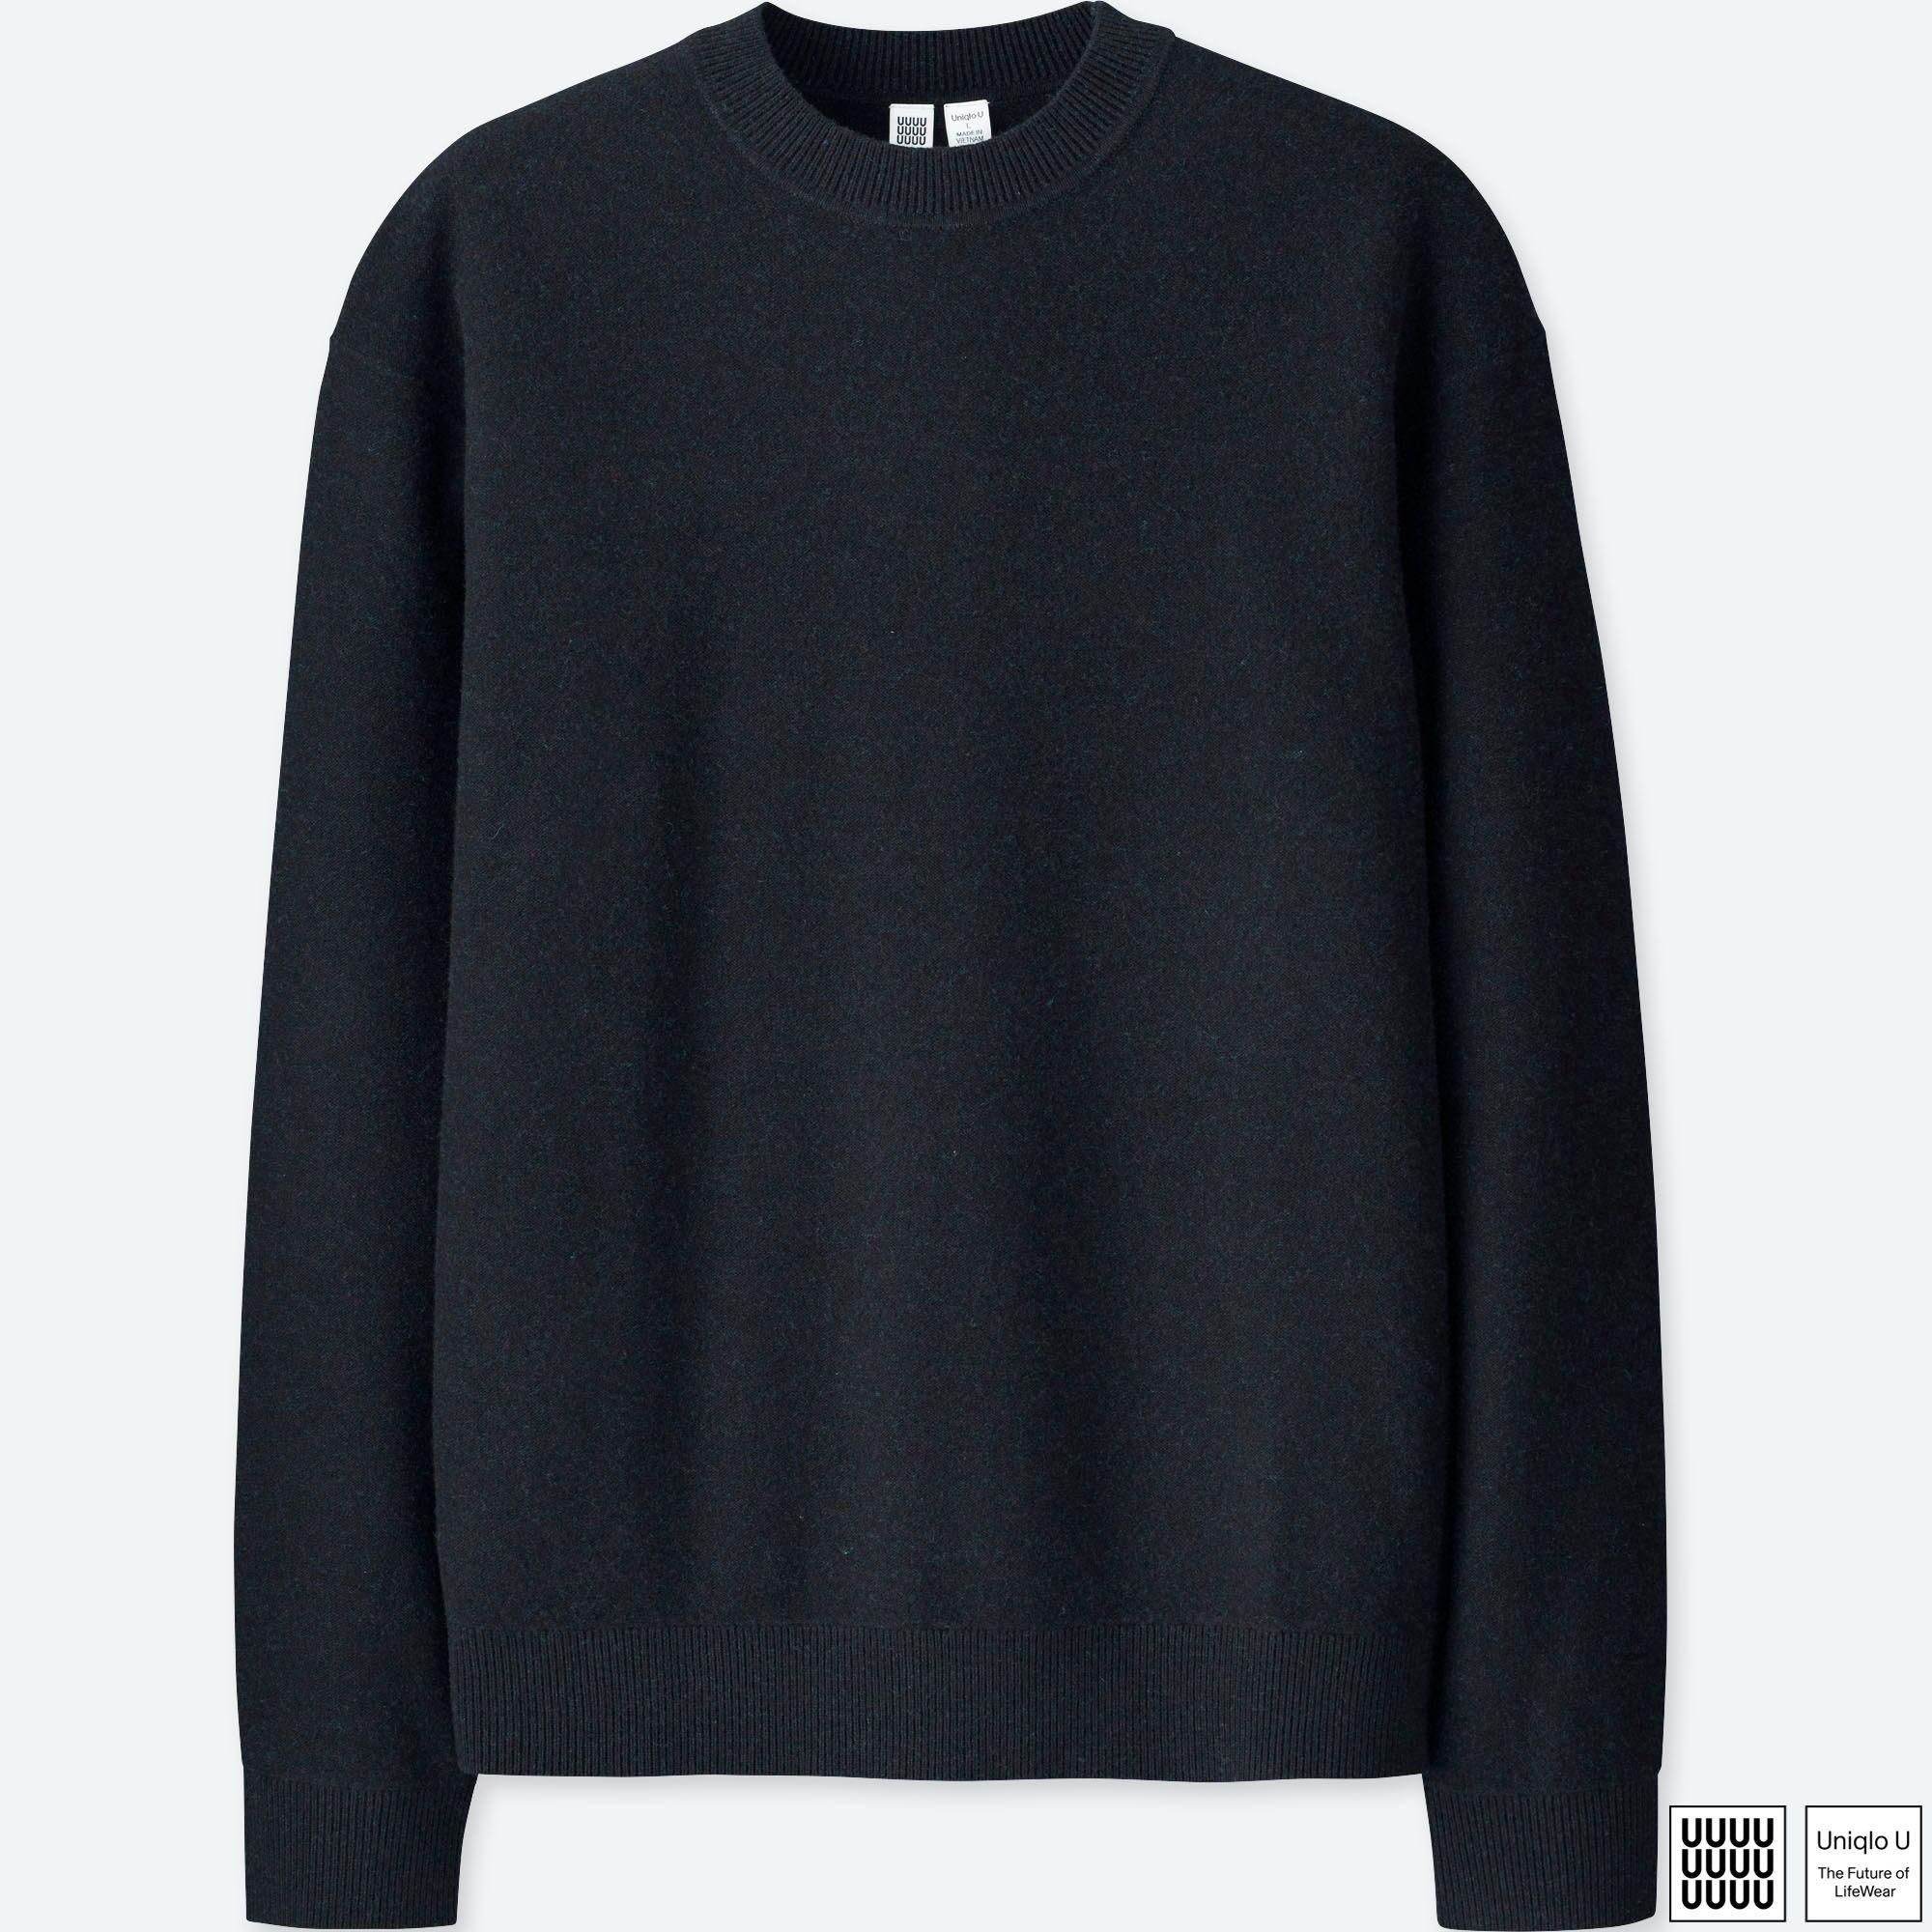 5f281572dd29fb Uniqlo U Premium Lambswool Crew Neck Long Sleeve Sweater in Black ...